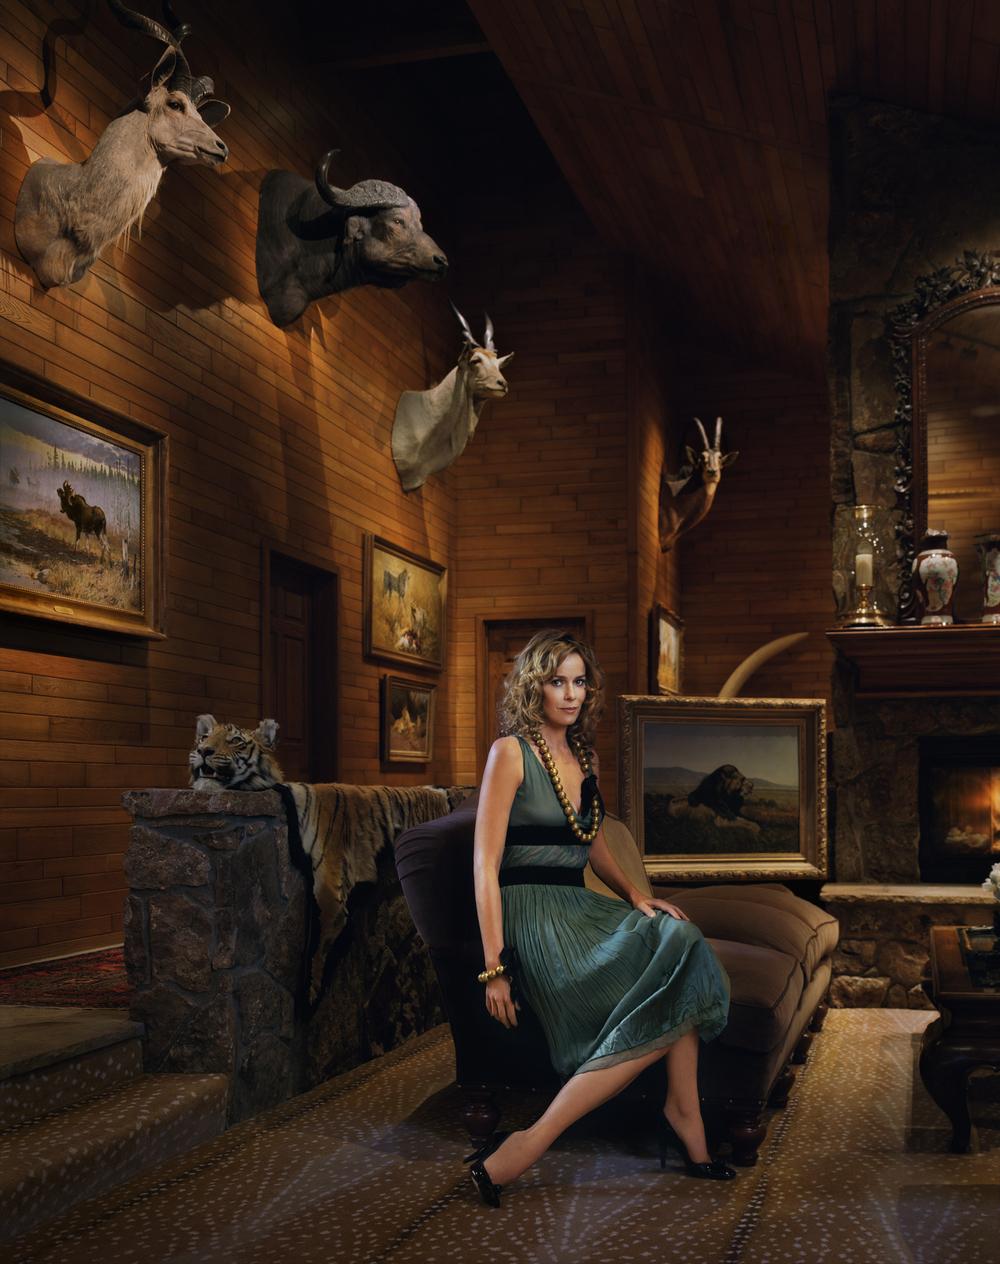 Julia Koch, wife of Koch Brother David Koch at their home in Aspen, CO